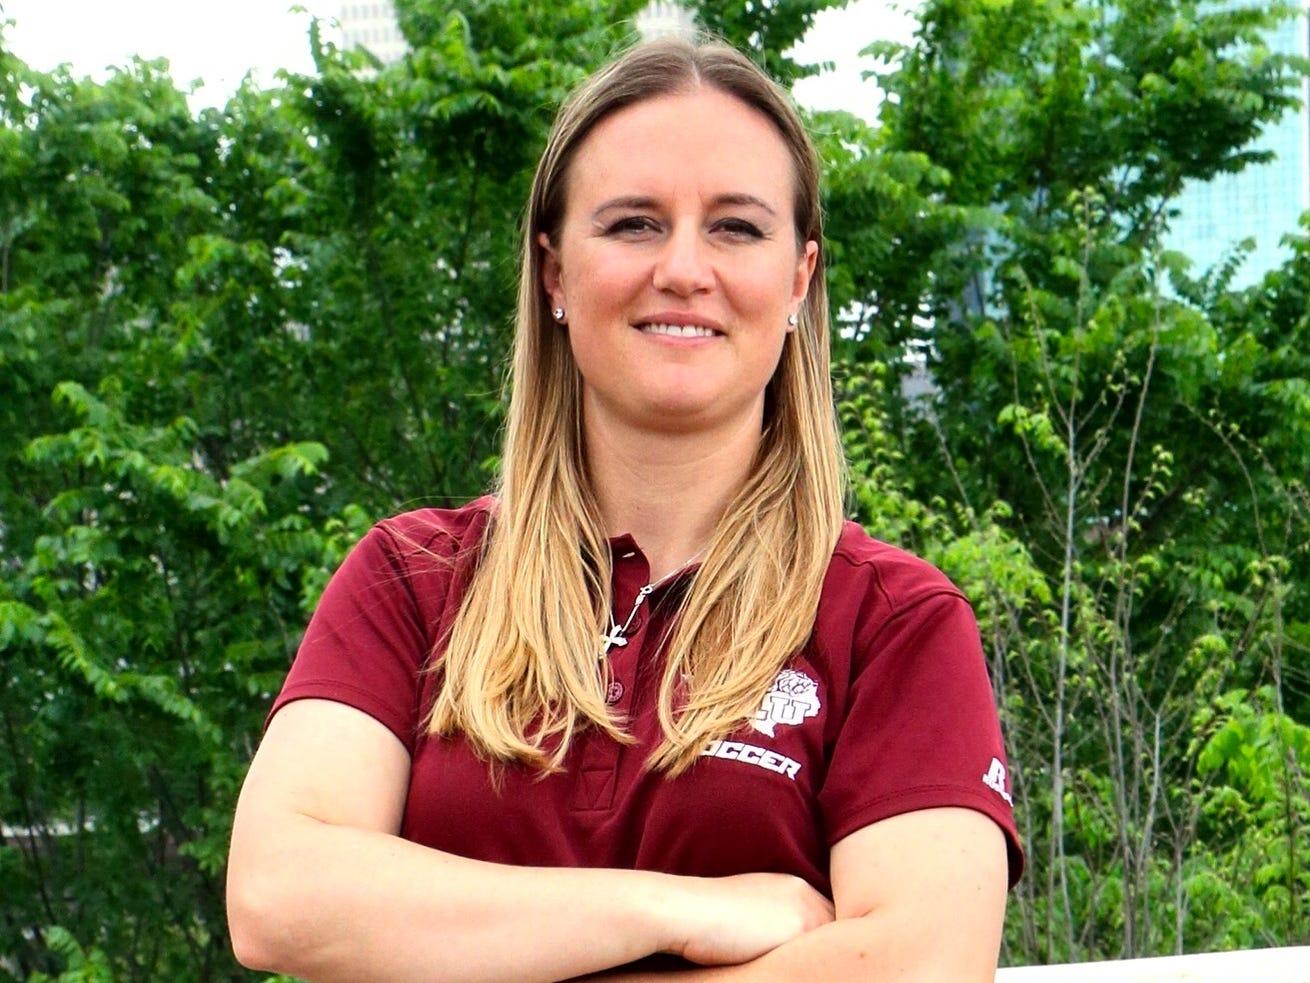 Texas Southern University's Kathryn Balogun named new women's soccer coach at UTEP